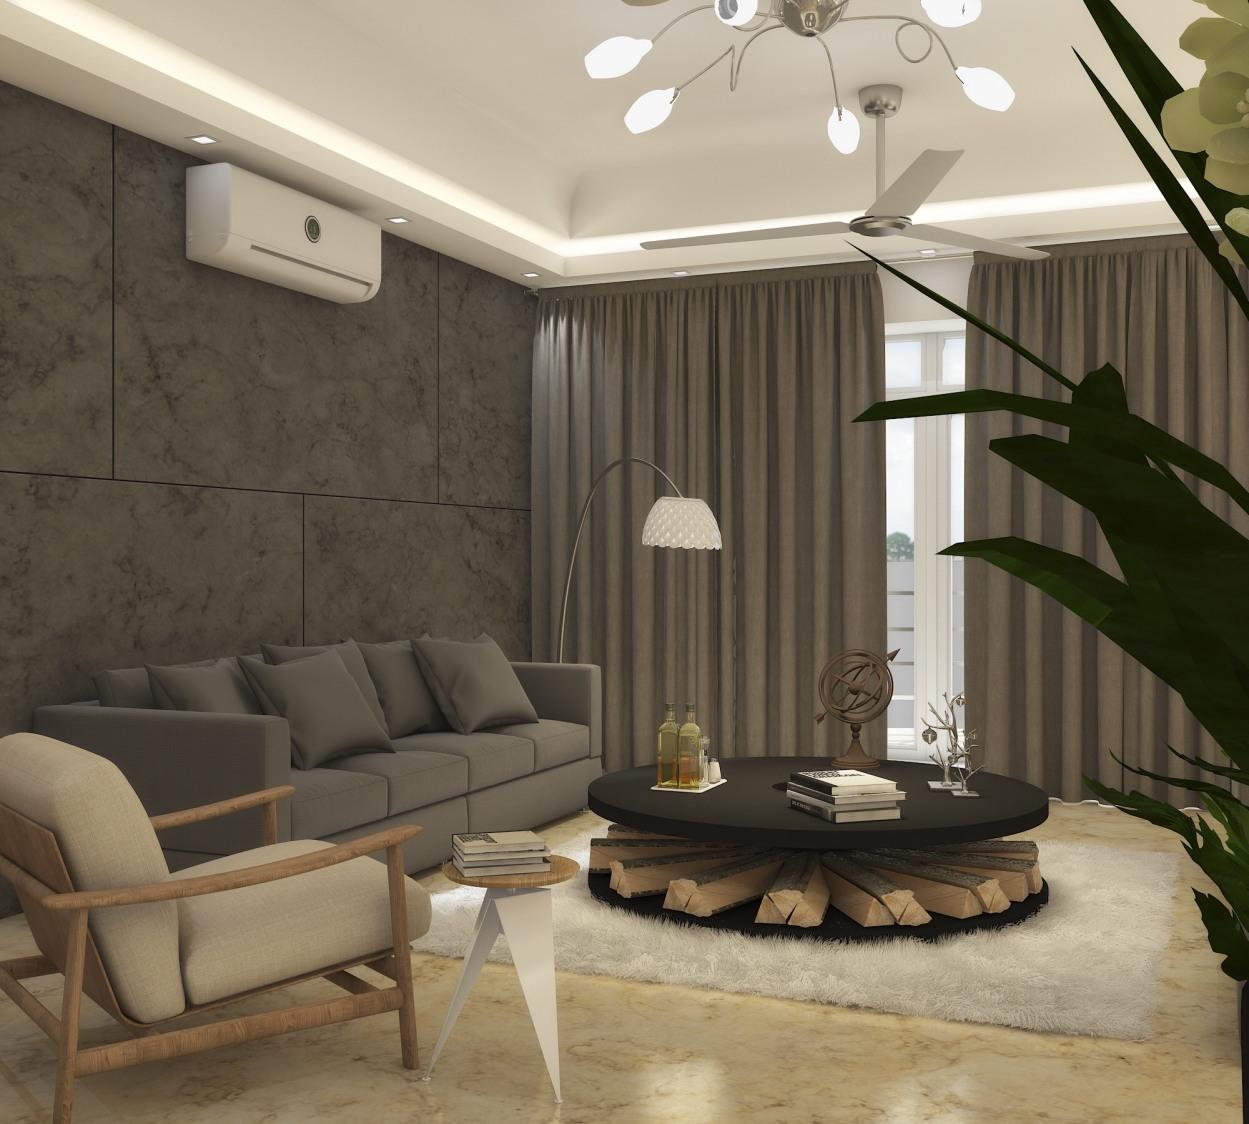 Grey  themed living room by KaSa Vivo Living-room Contemporary | Interior Design Photos & Ideas